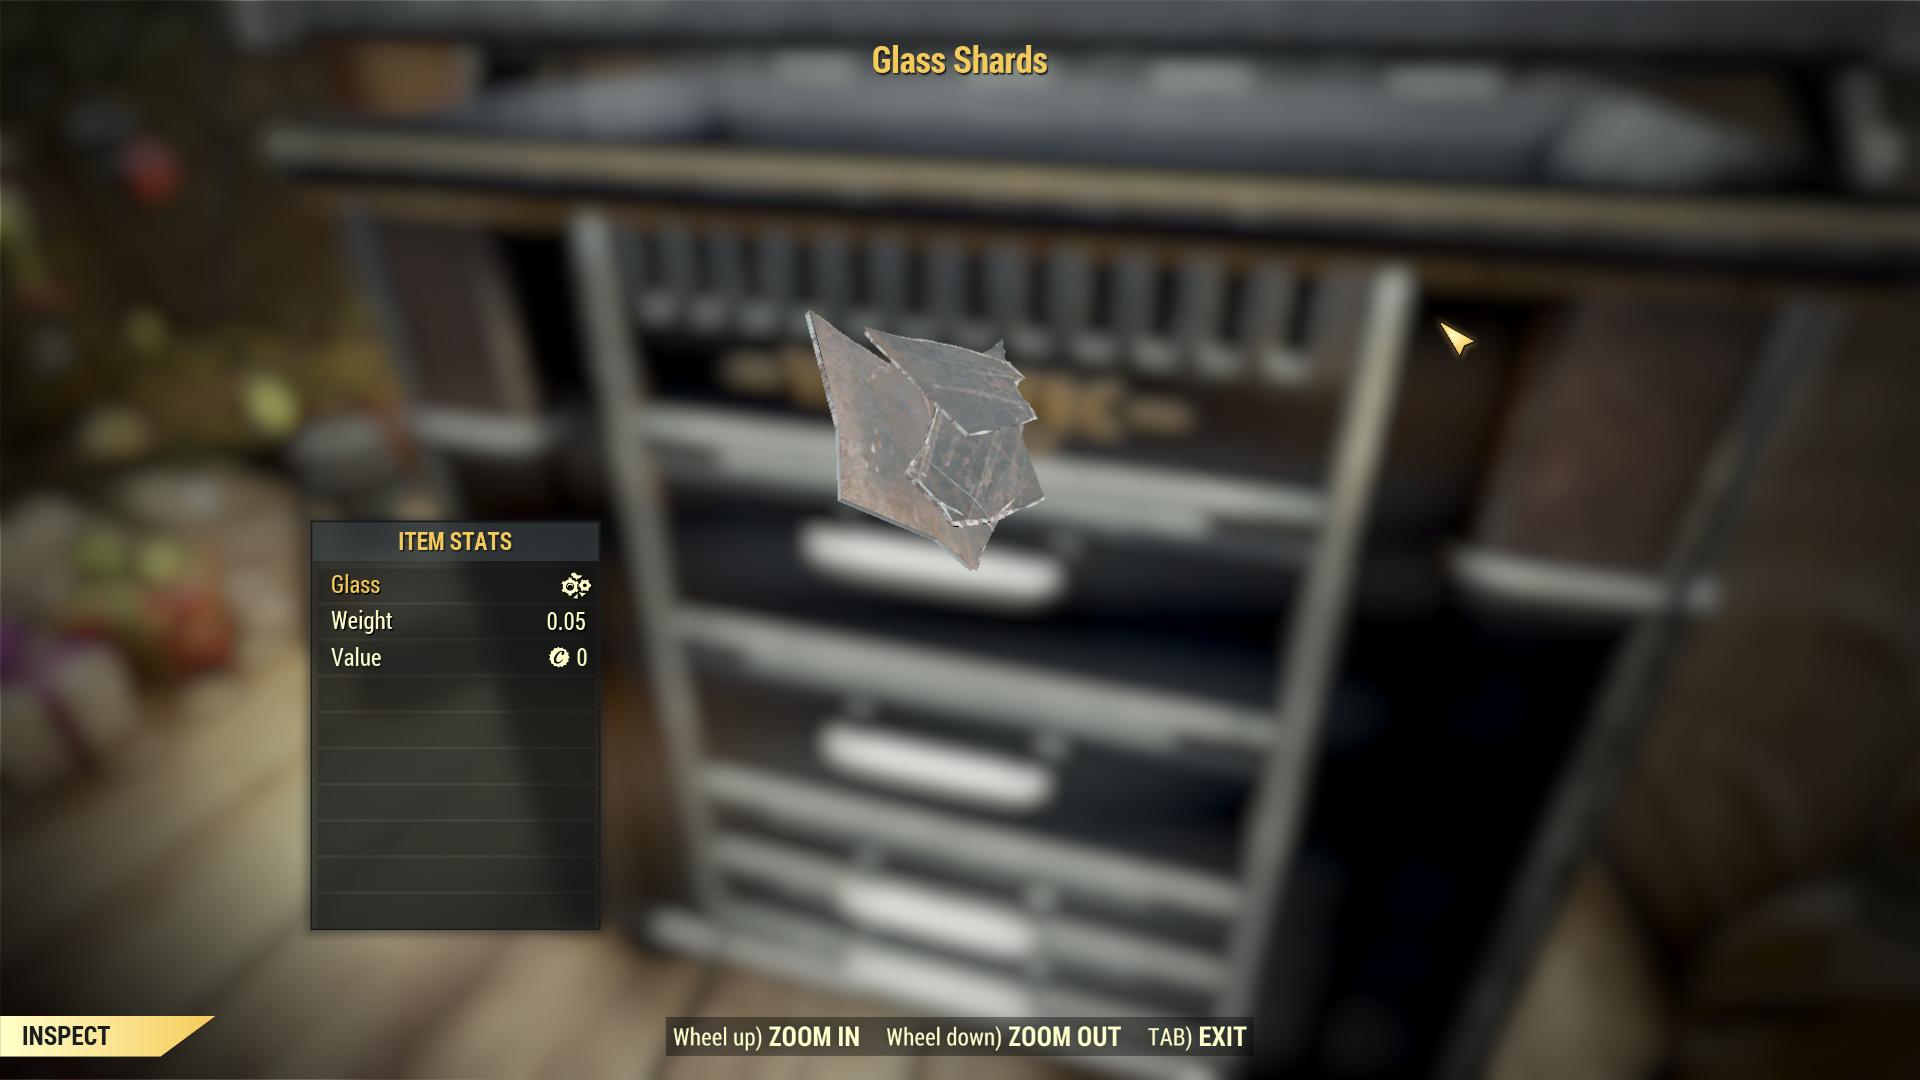 Glass Shards x1000